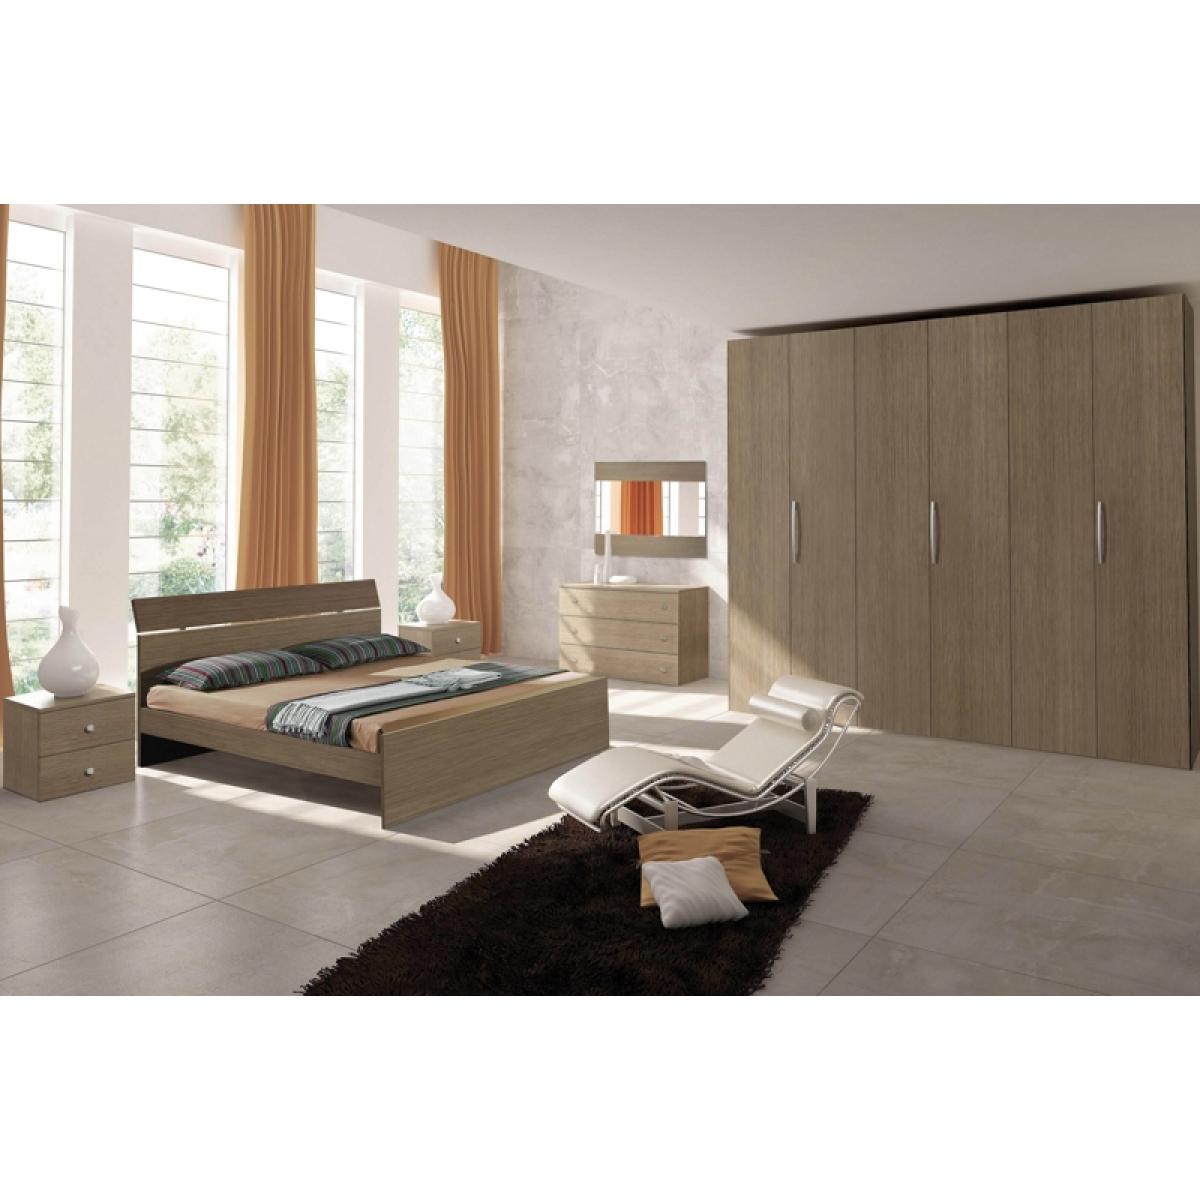 387 camera da letto completa moderna grigio larice - Camera da letto a ponte moderna ...